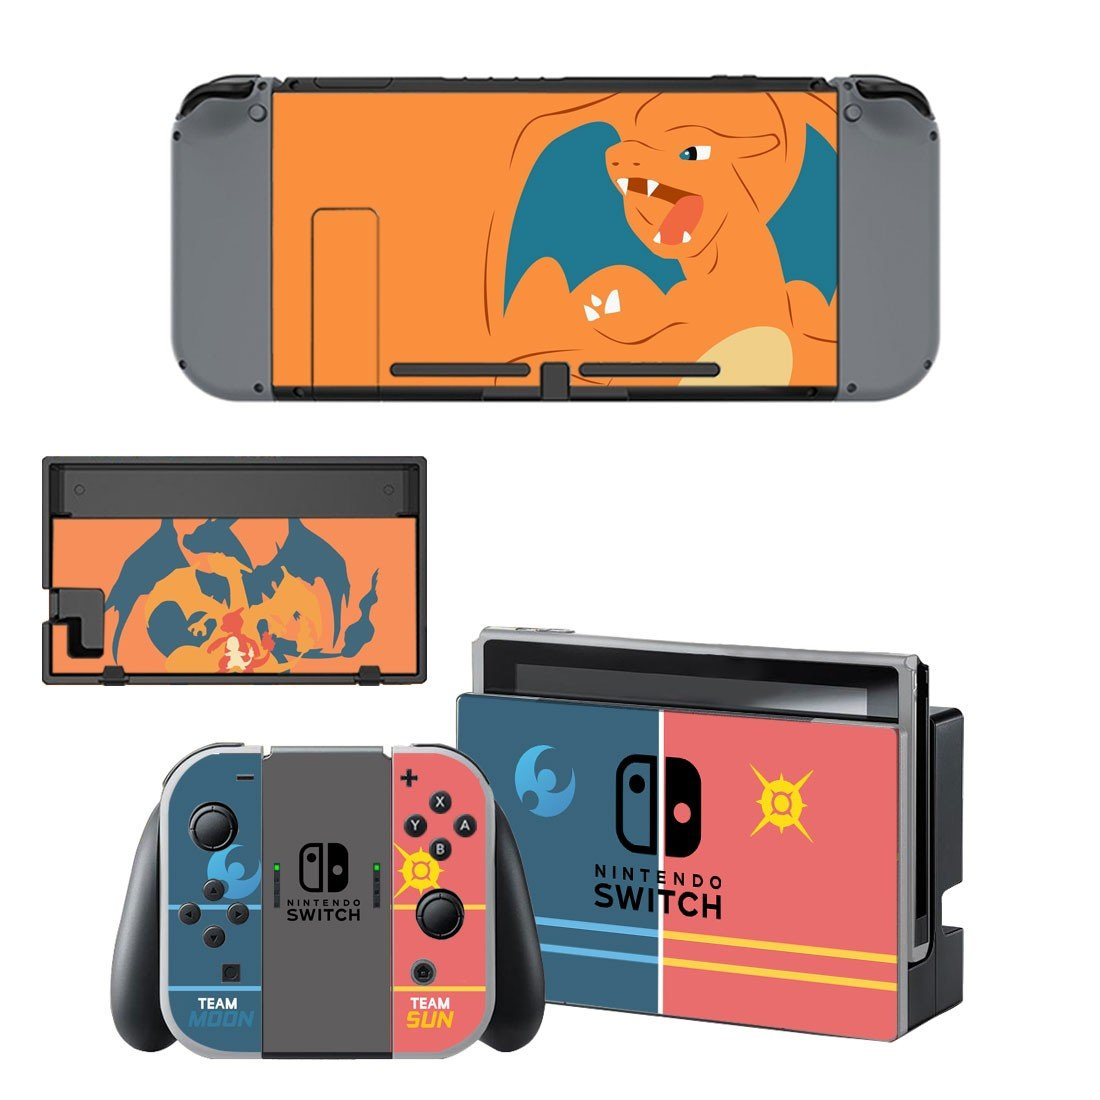 Nintendo Switch decal for Nintendo switch console sticker skin